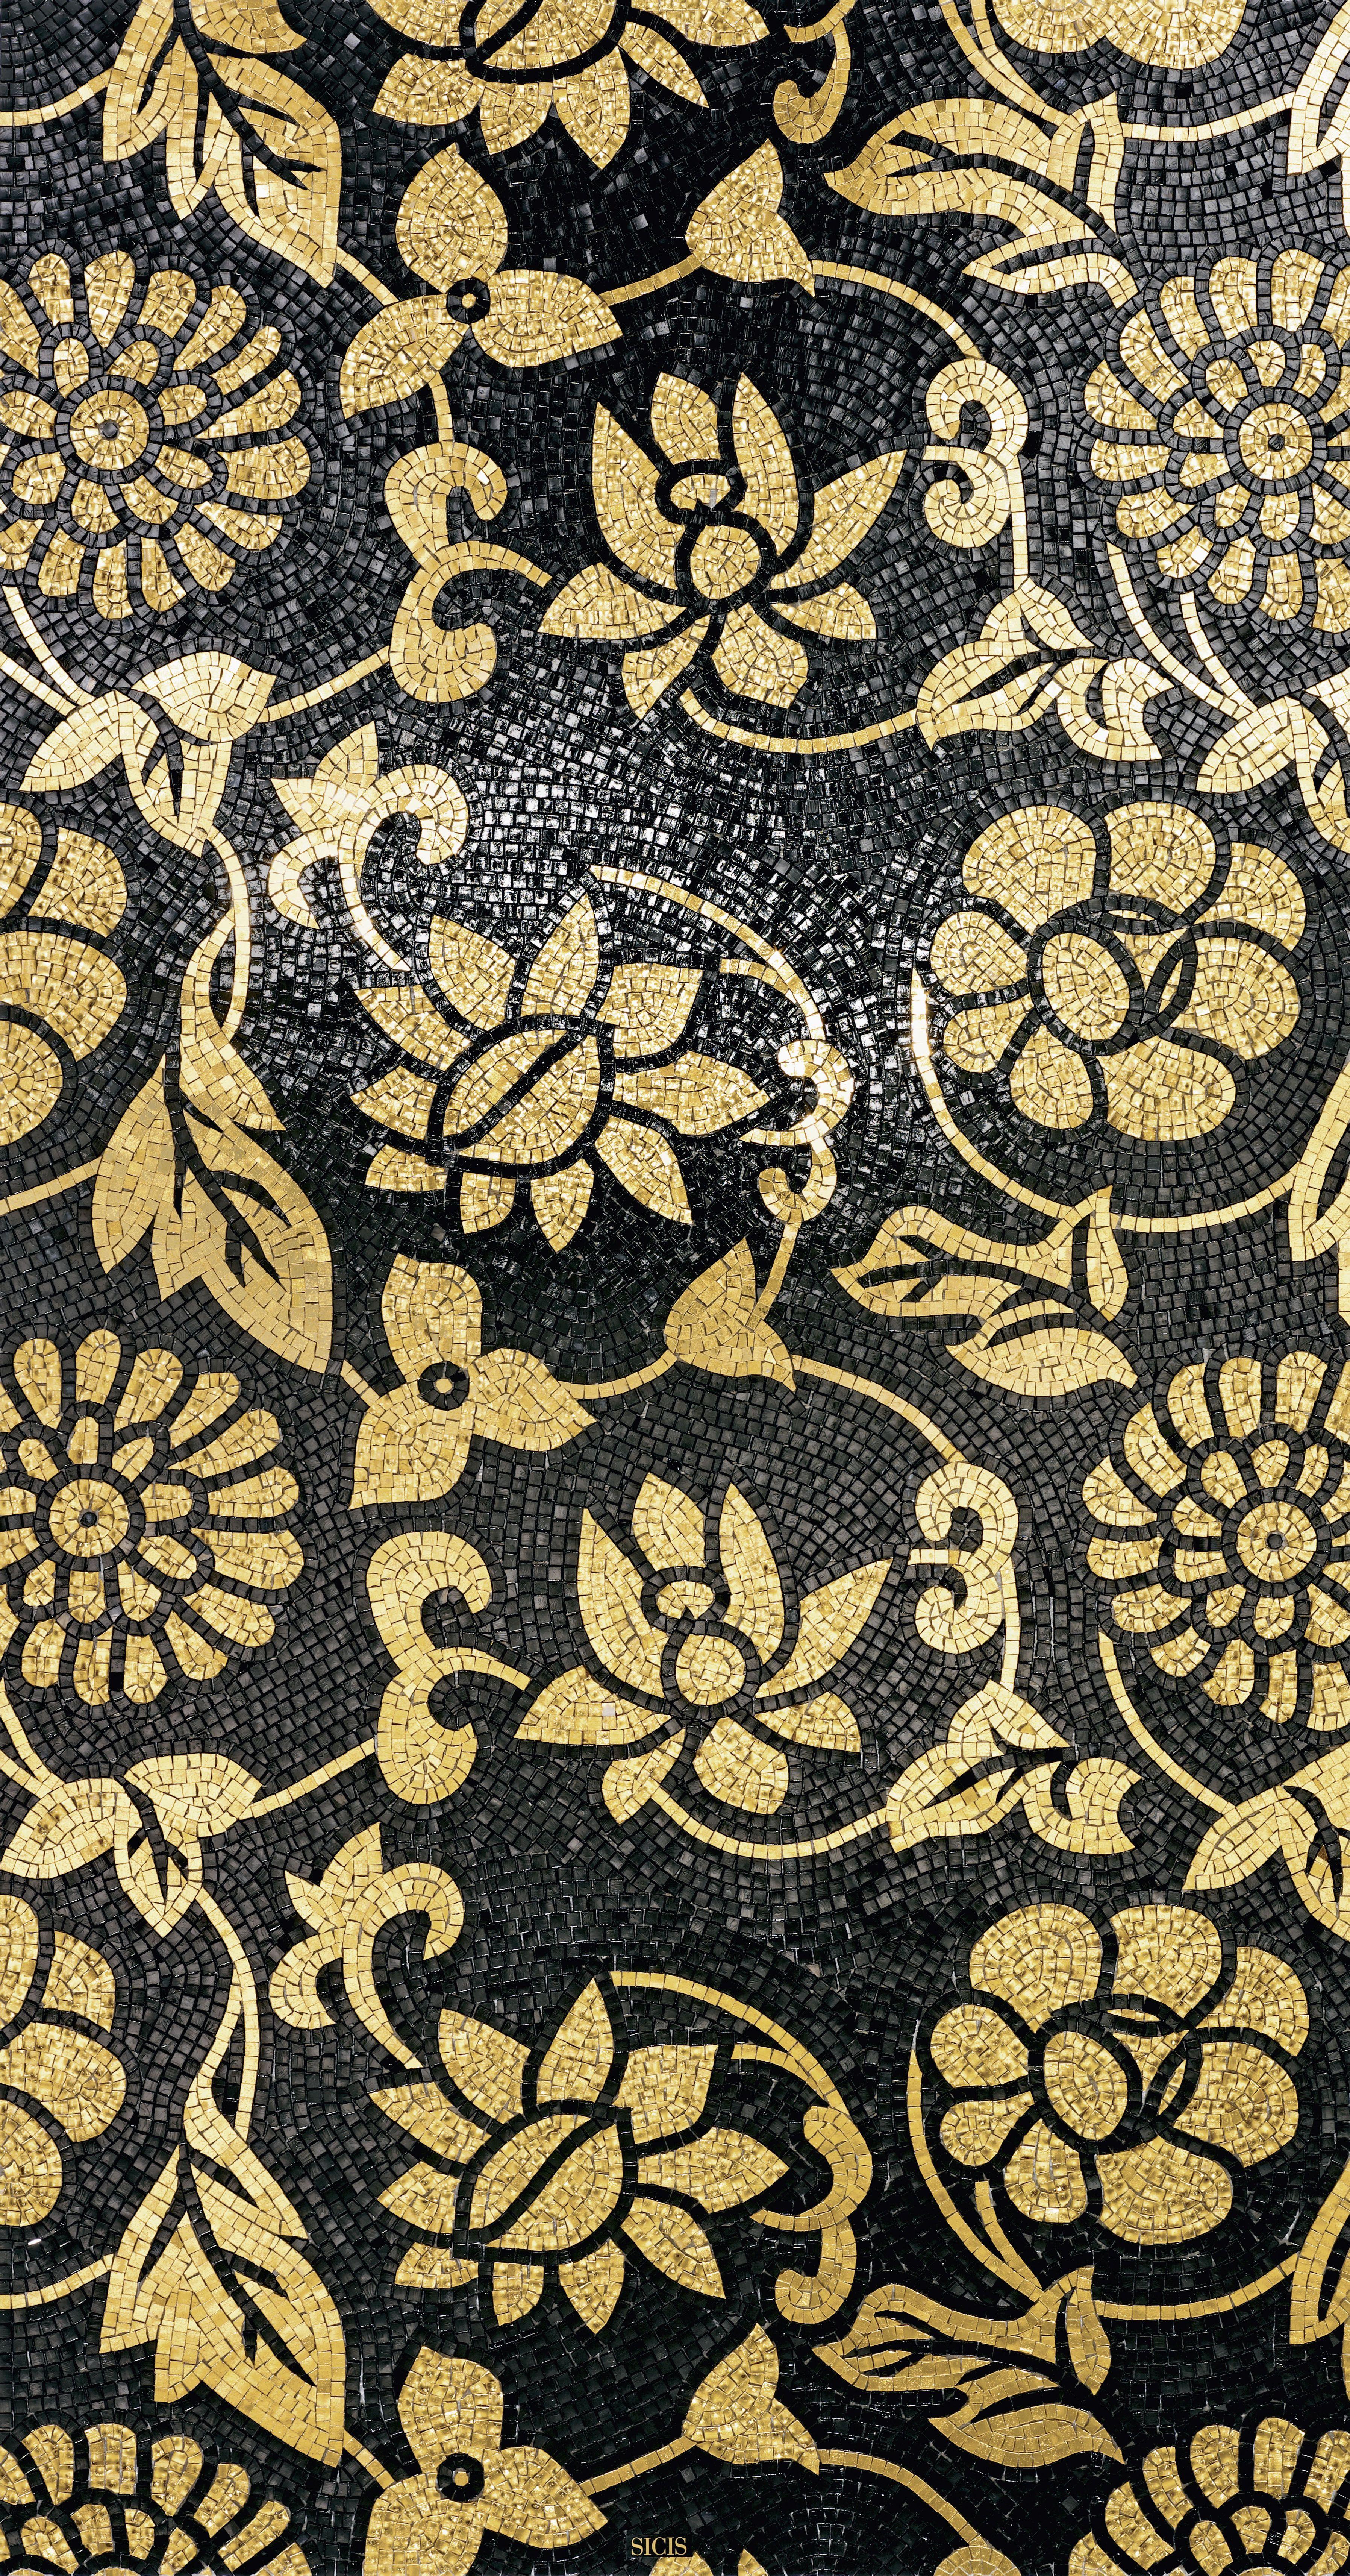 New Ravenna Tile >> Orientale collection by Sicis #mosaic   mosaics   Mosaic